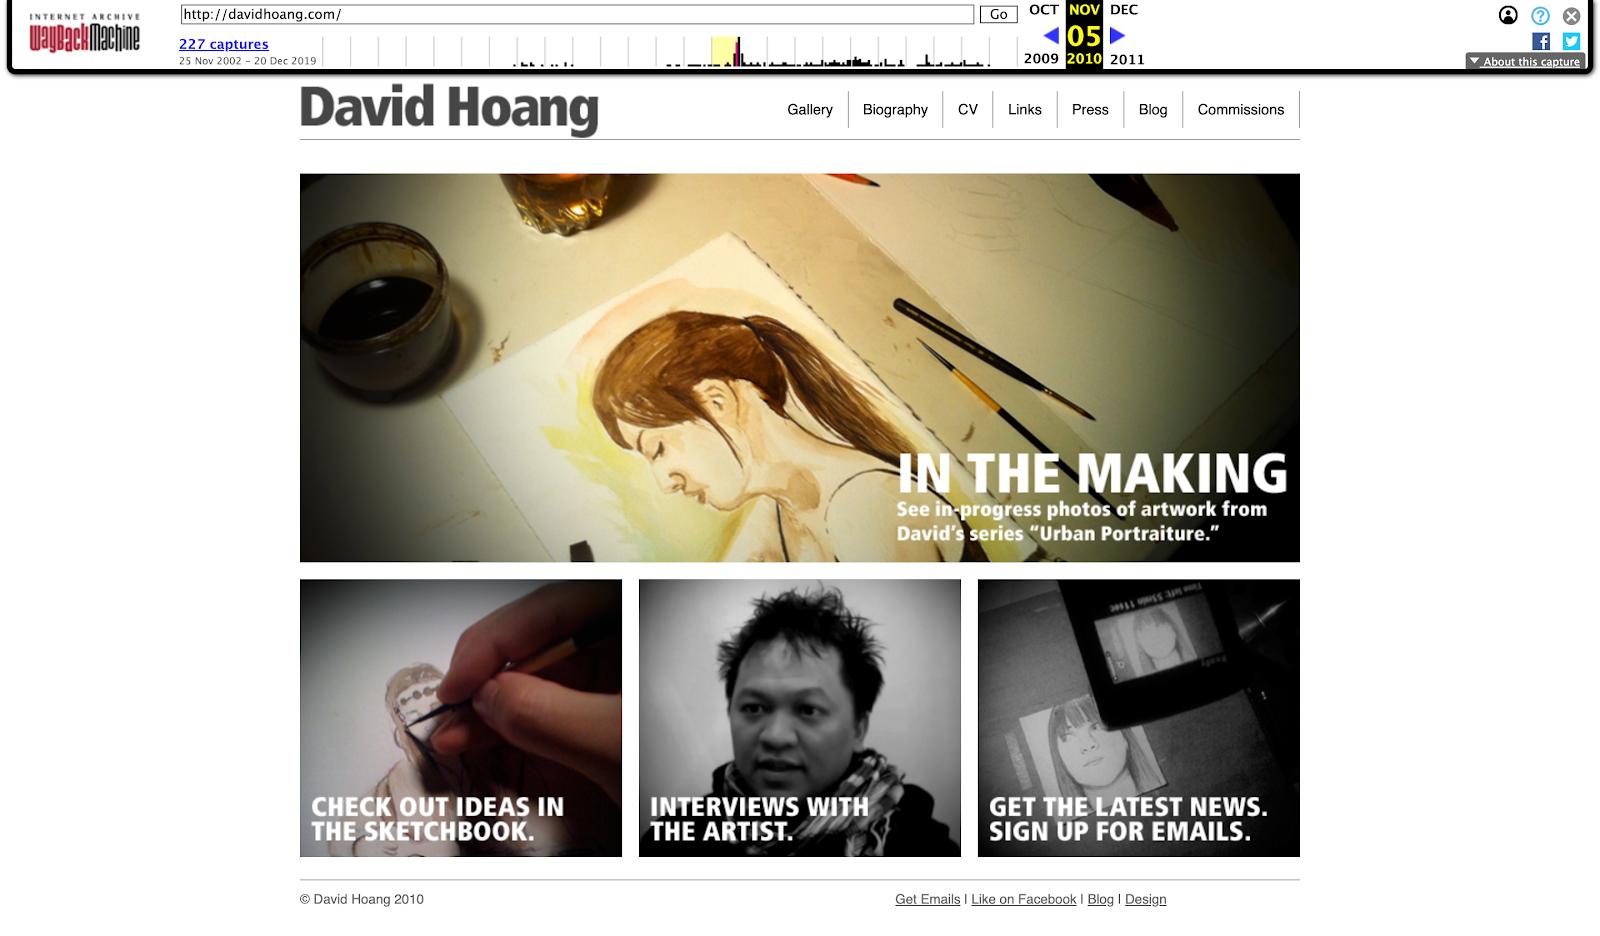 Davidhoang.com in 2010